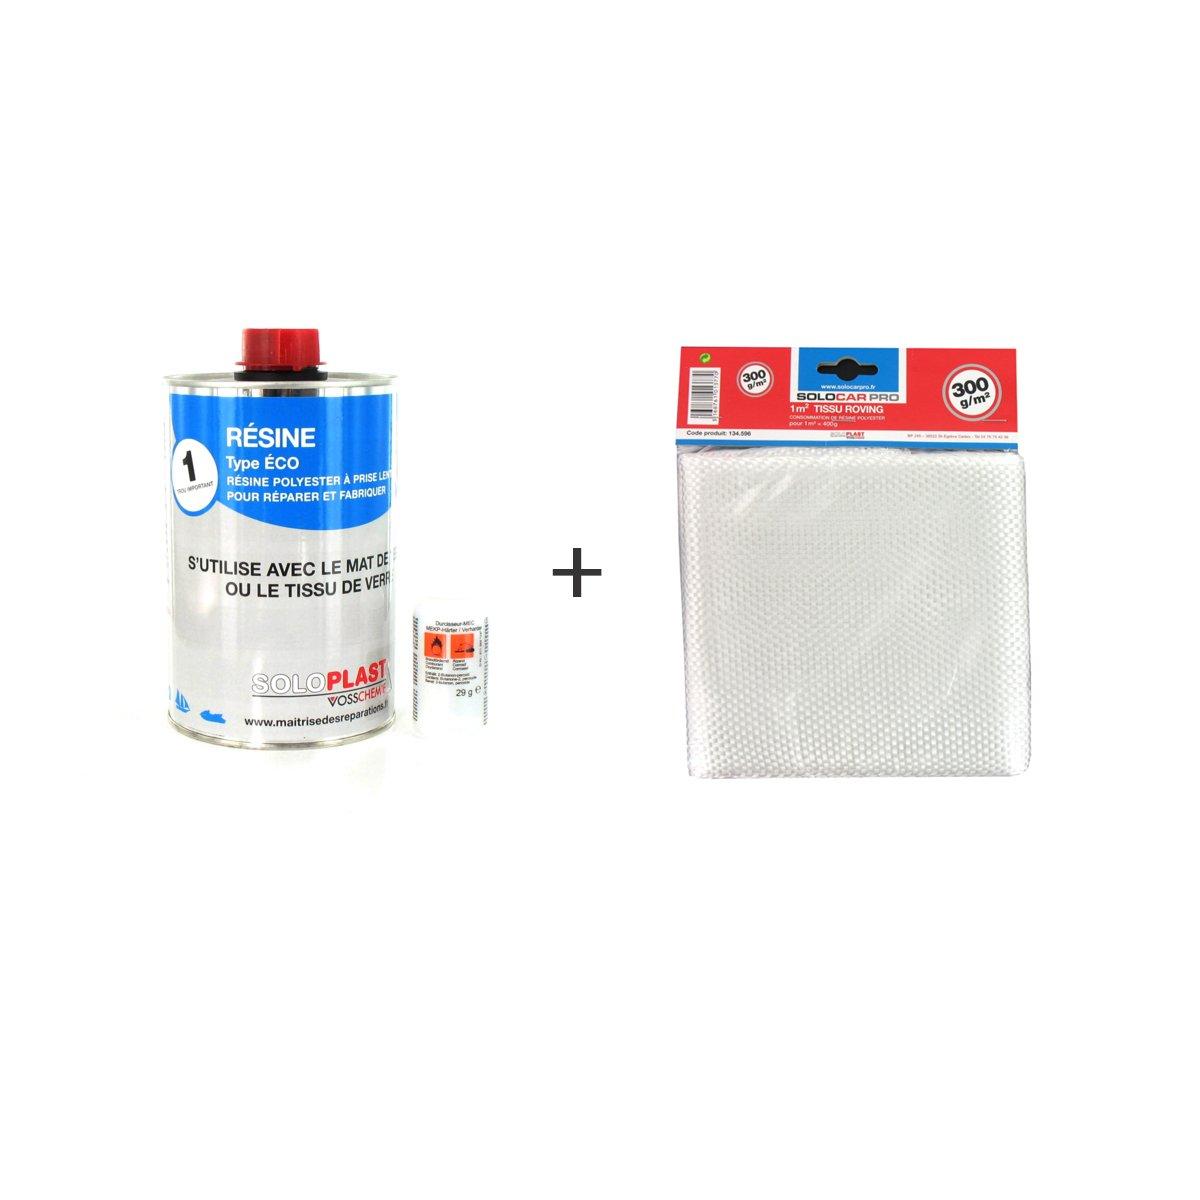 Pack ré sine polyester type Eco Soloplast 1 Kg - Tissu de verre Soloplast Roving 300g m2